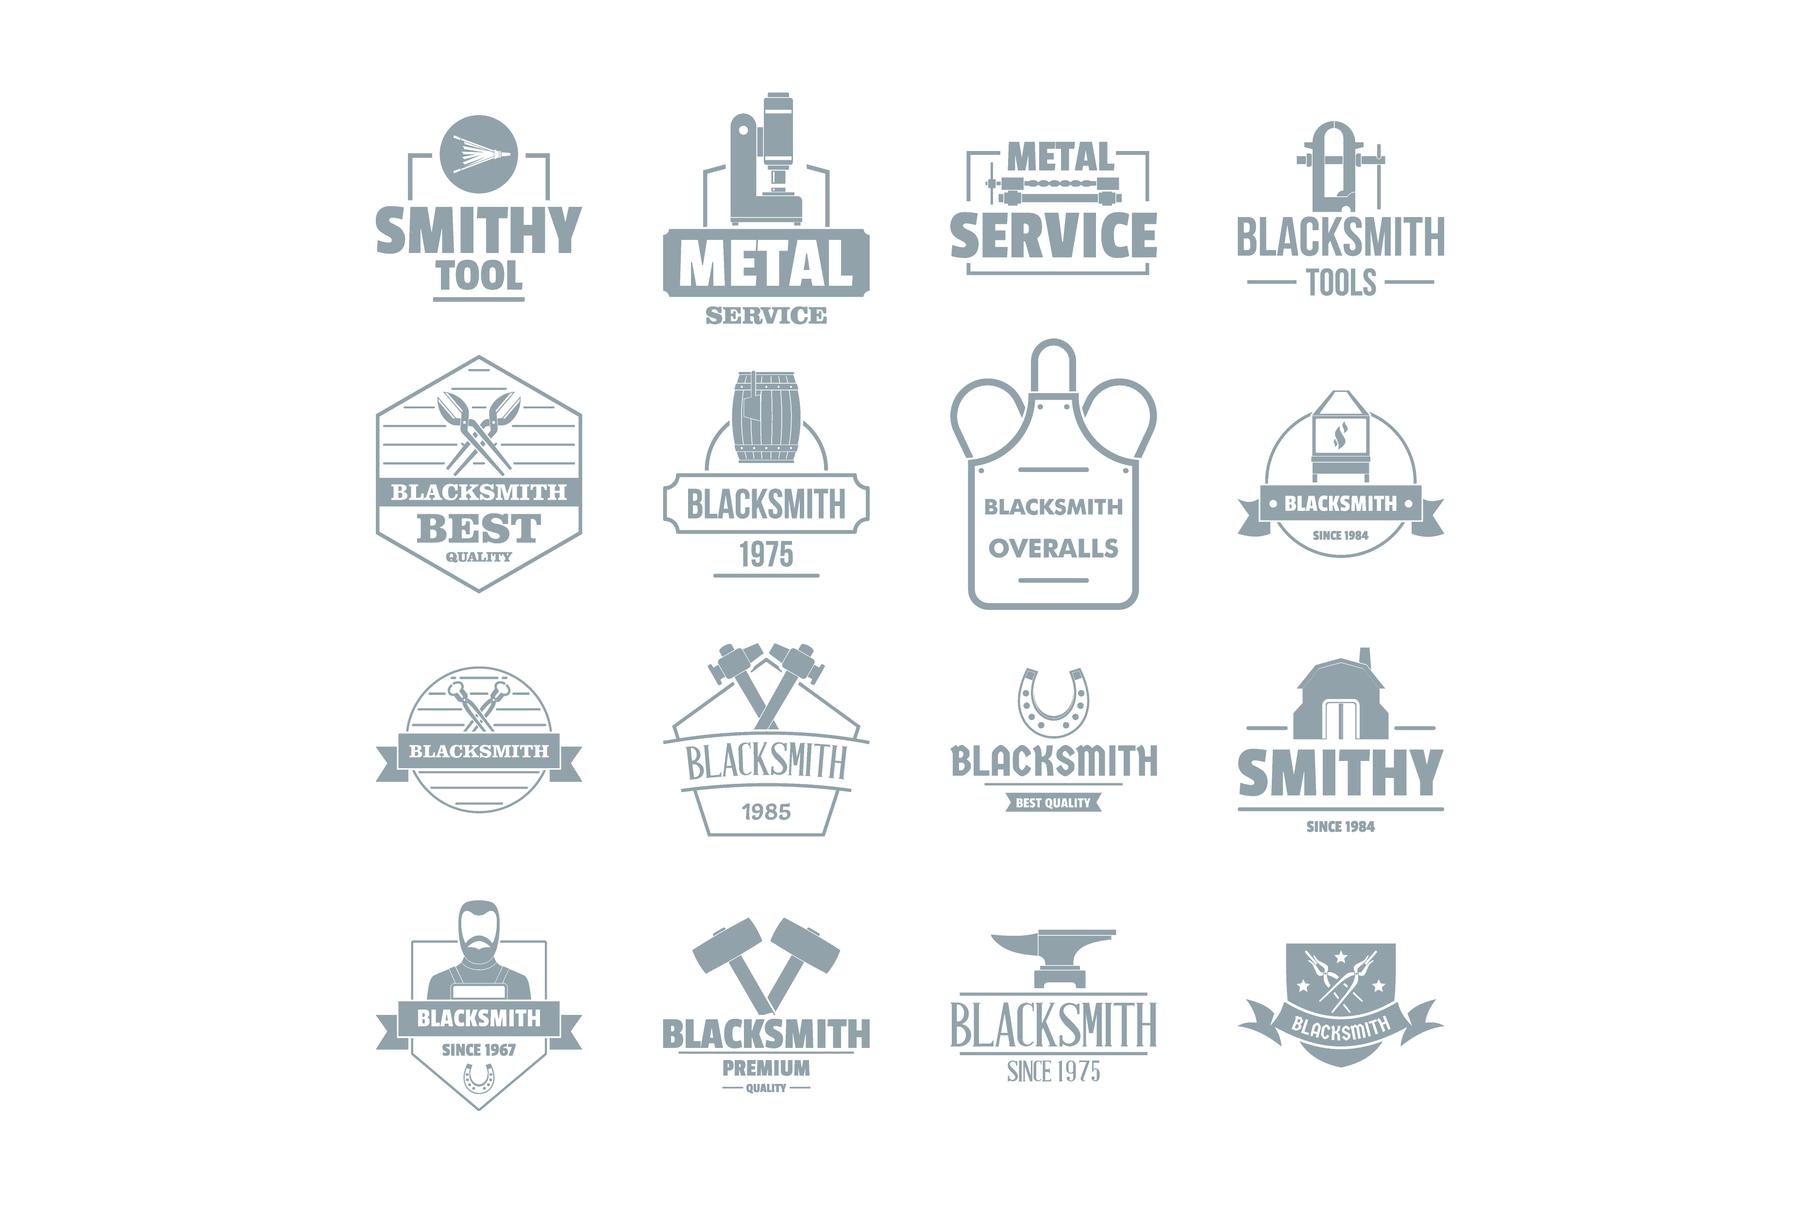 Blacksmith metal logo icons set, simple style example image 1